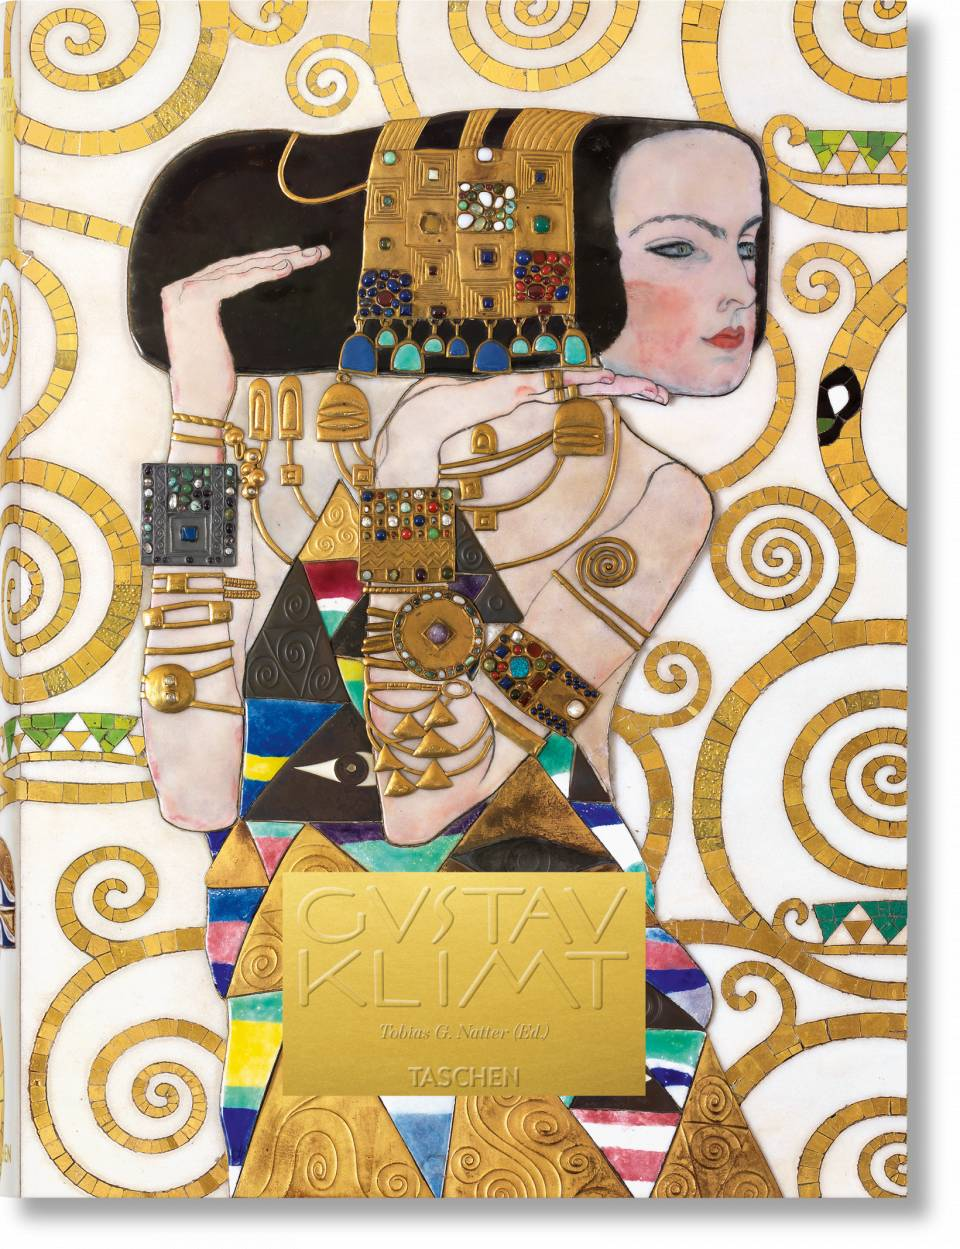 Gustav Klimt. The Complete Paintings.